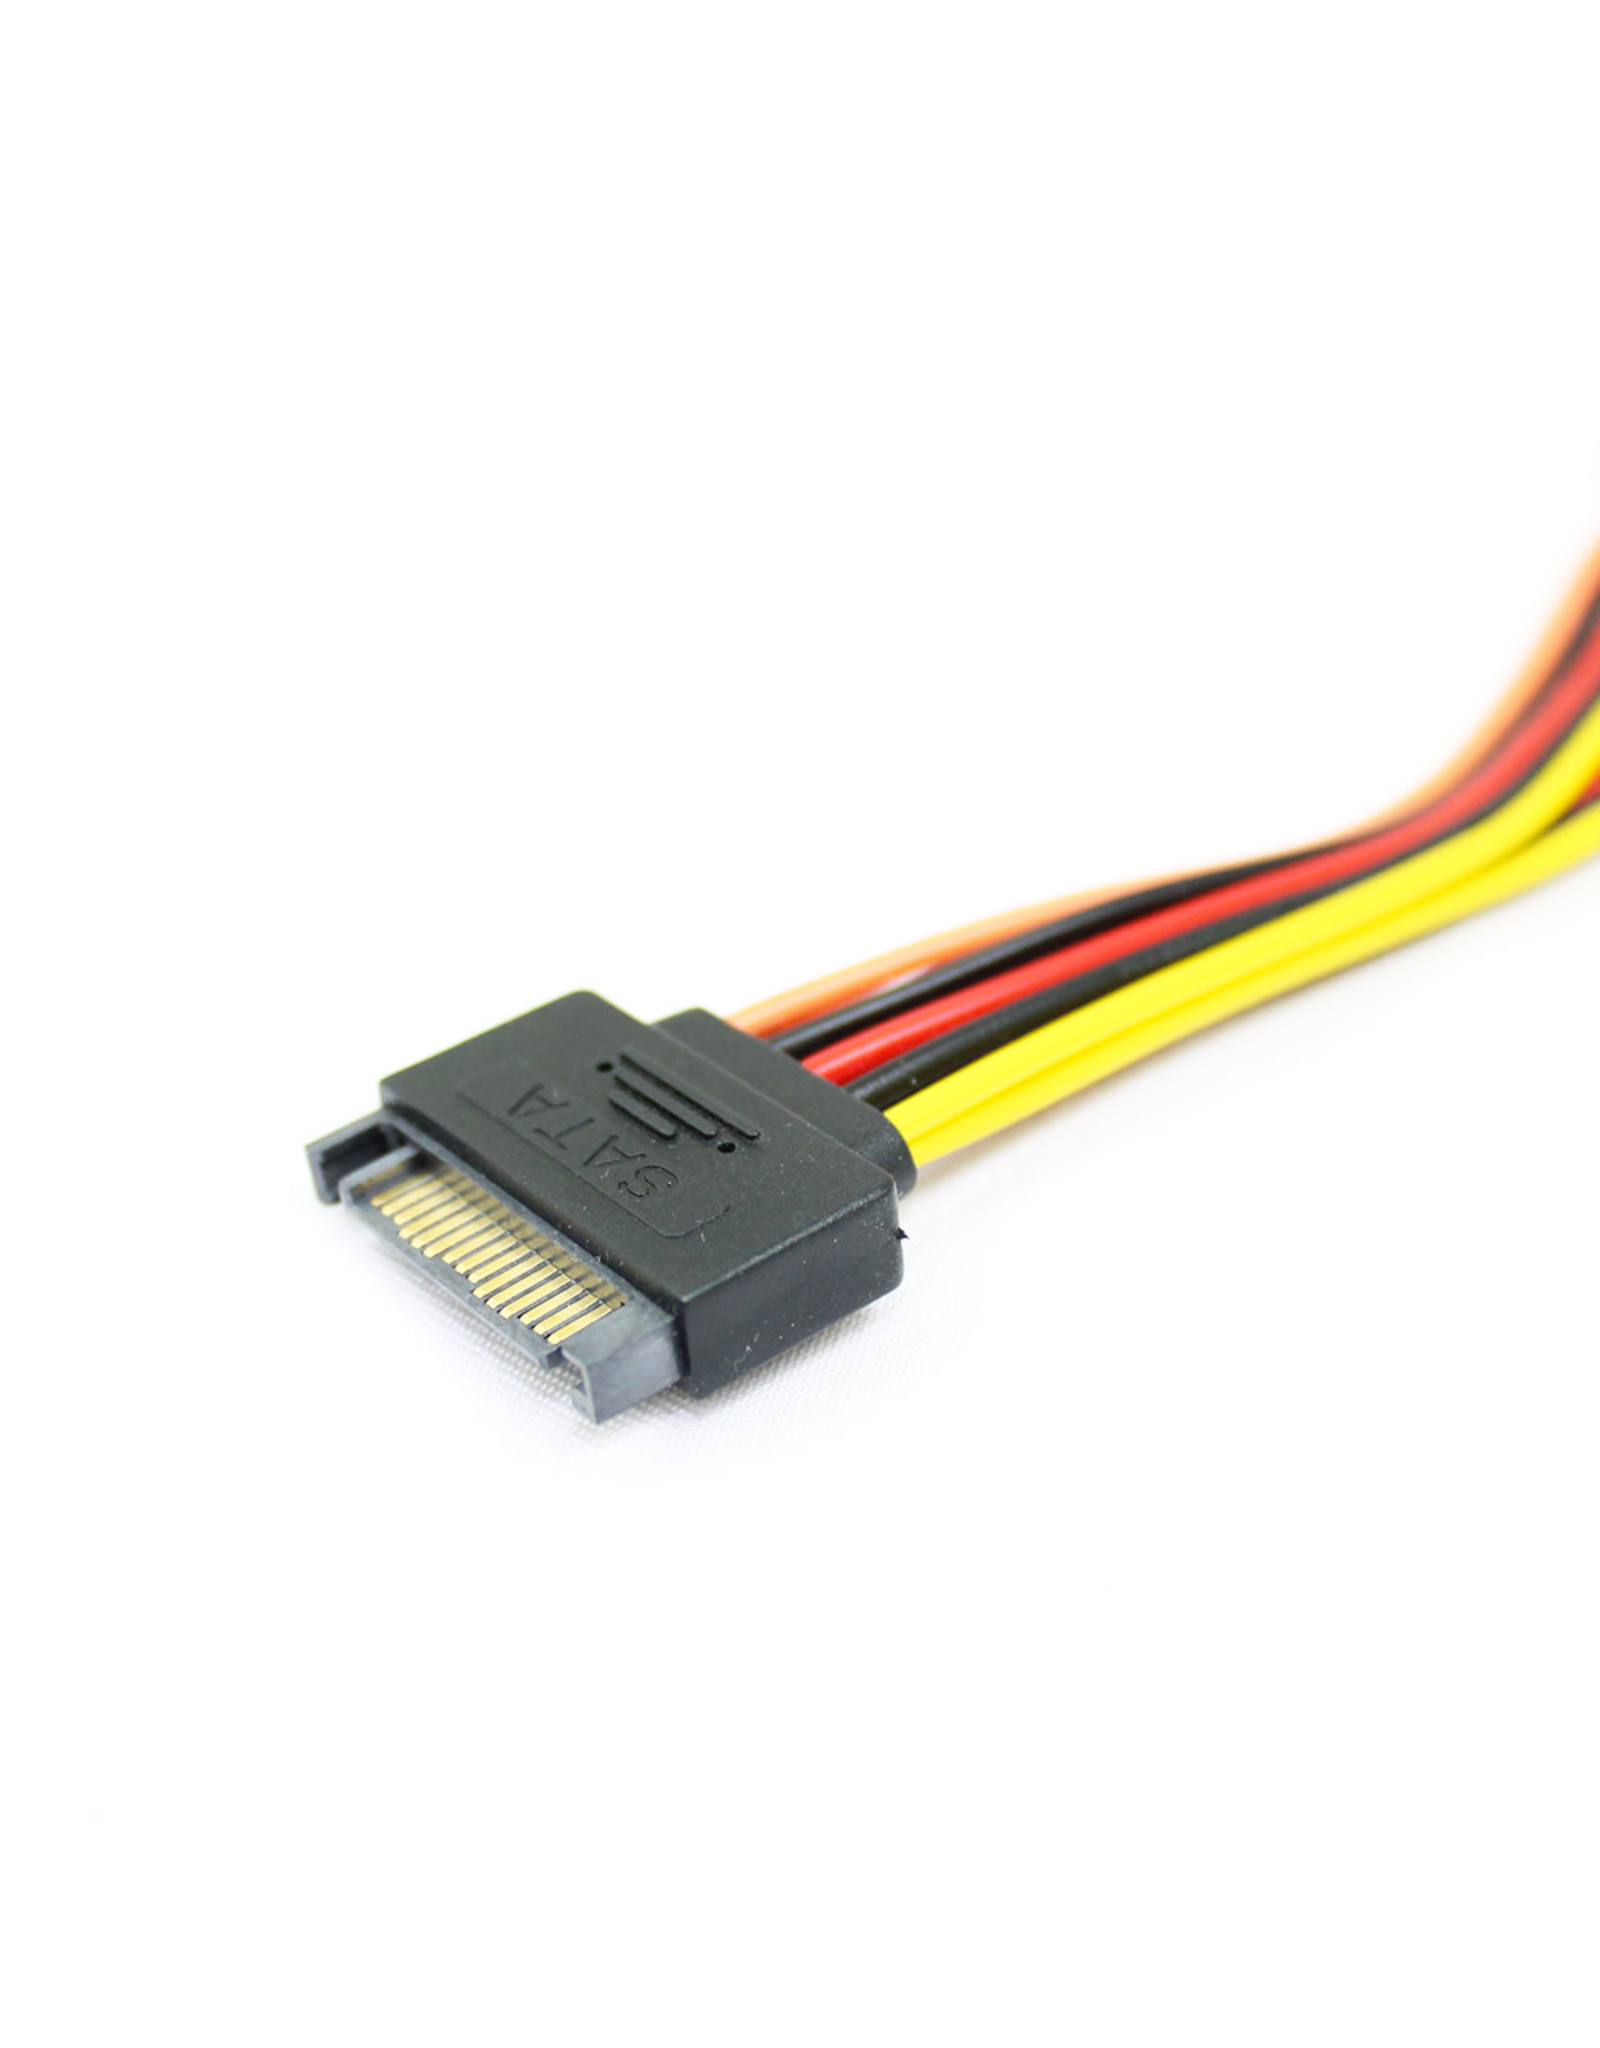 BlueDiamond BlueDiamond, SATA Y Splitter Cable, 6in